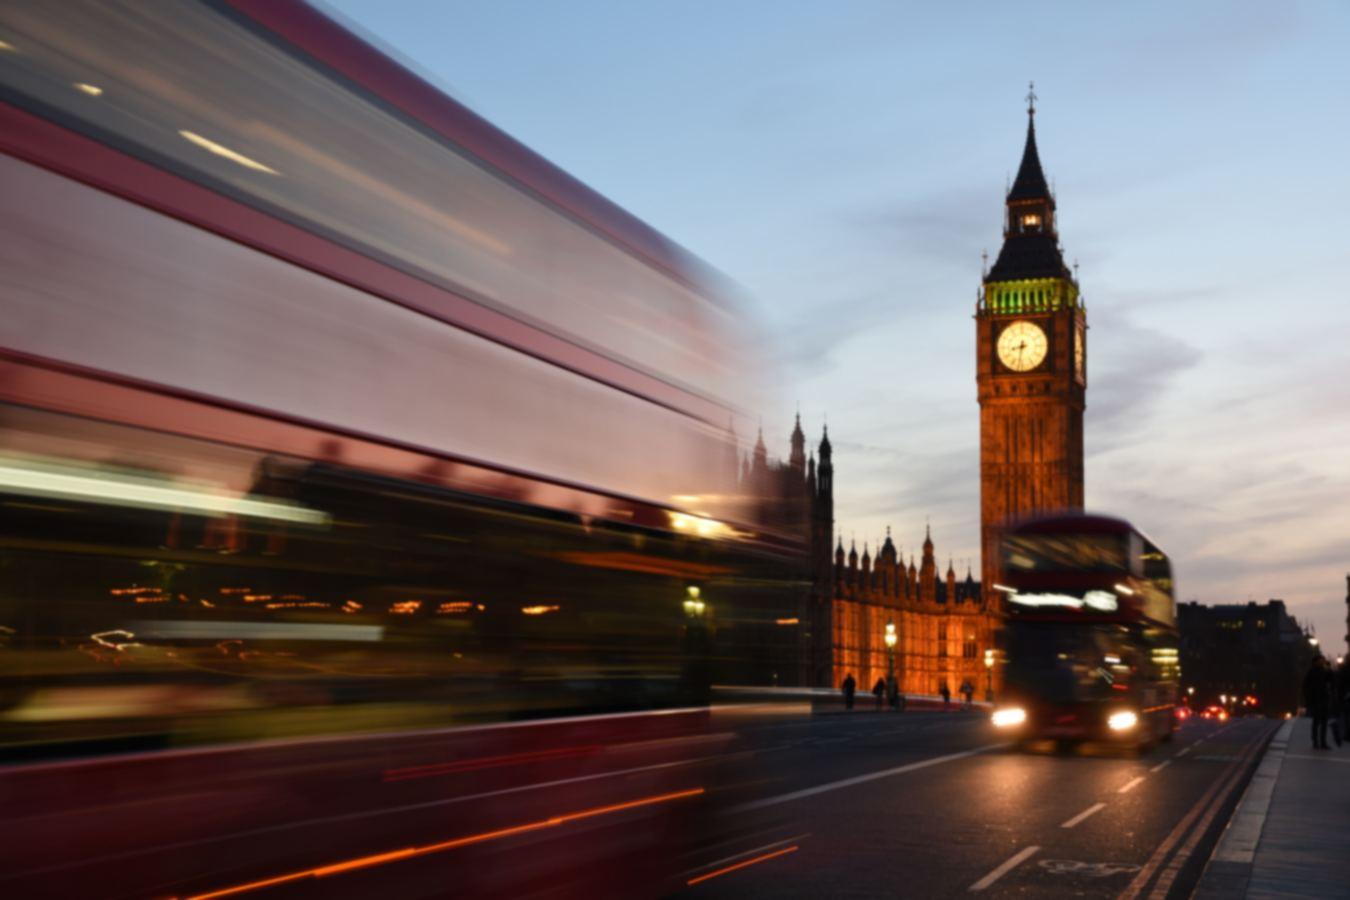 UK Digital Ad Spending by Industry 2018